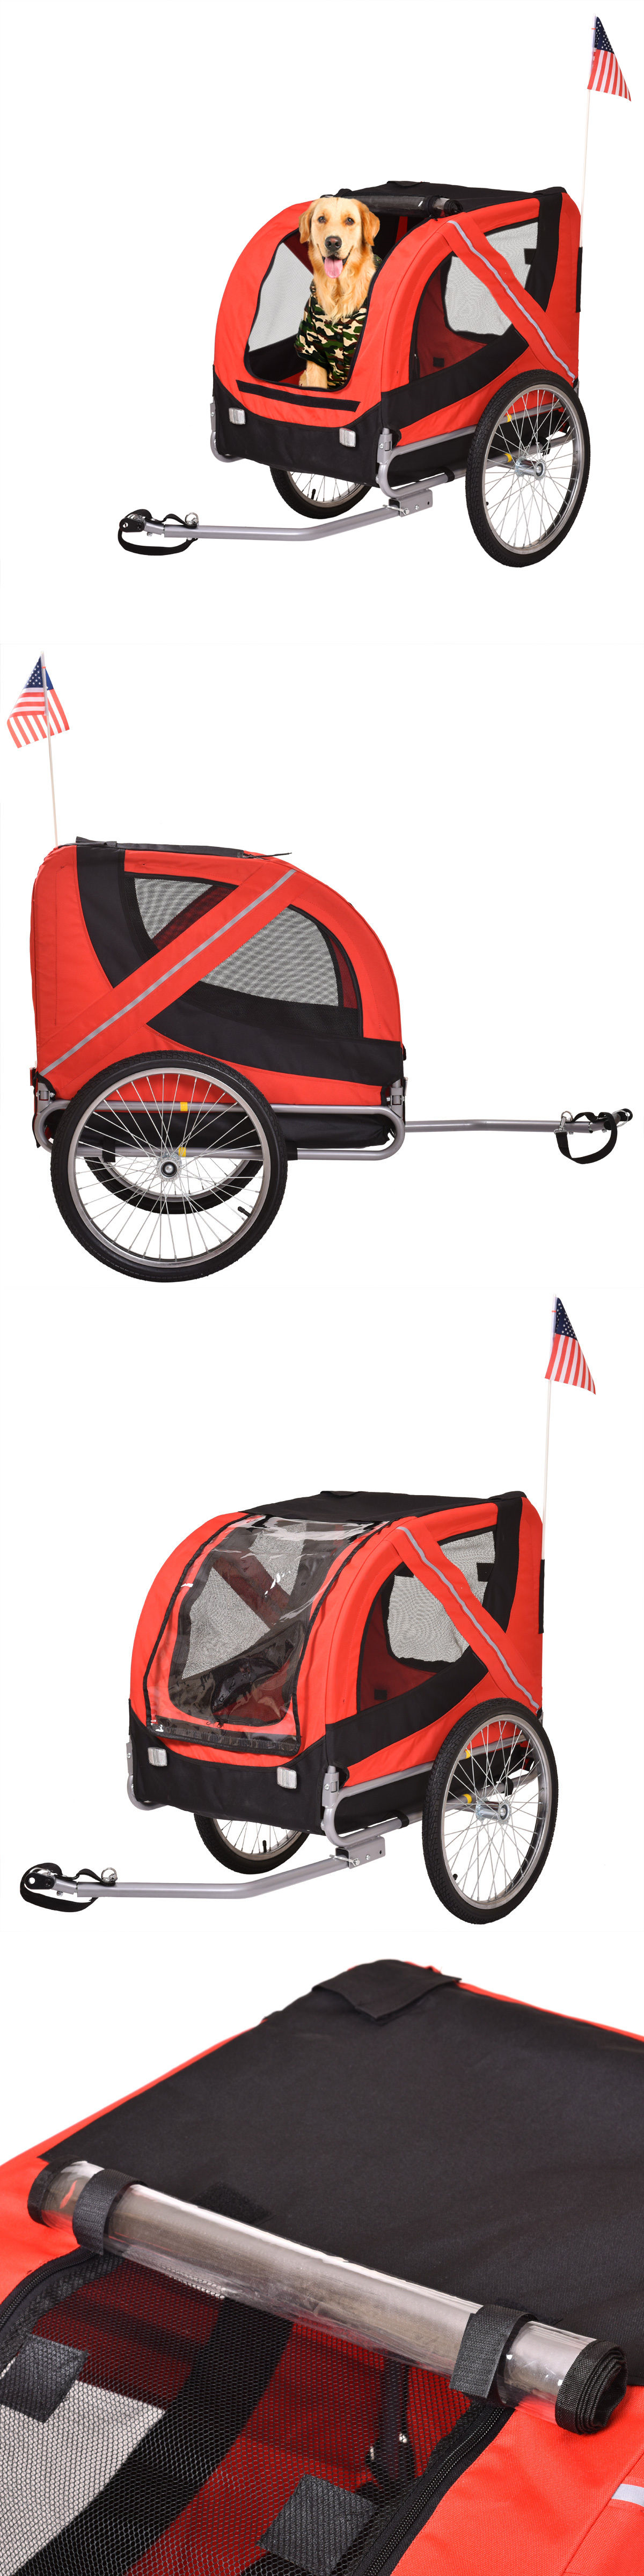 Strollers folding pet carrier dog cat bike trailer bicycle